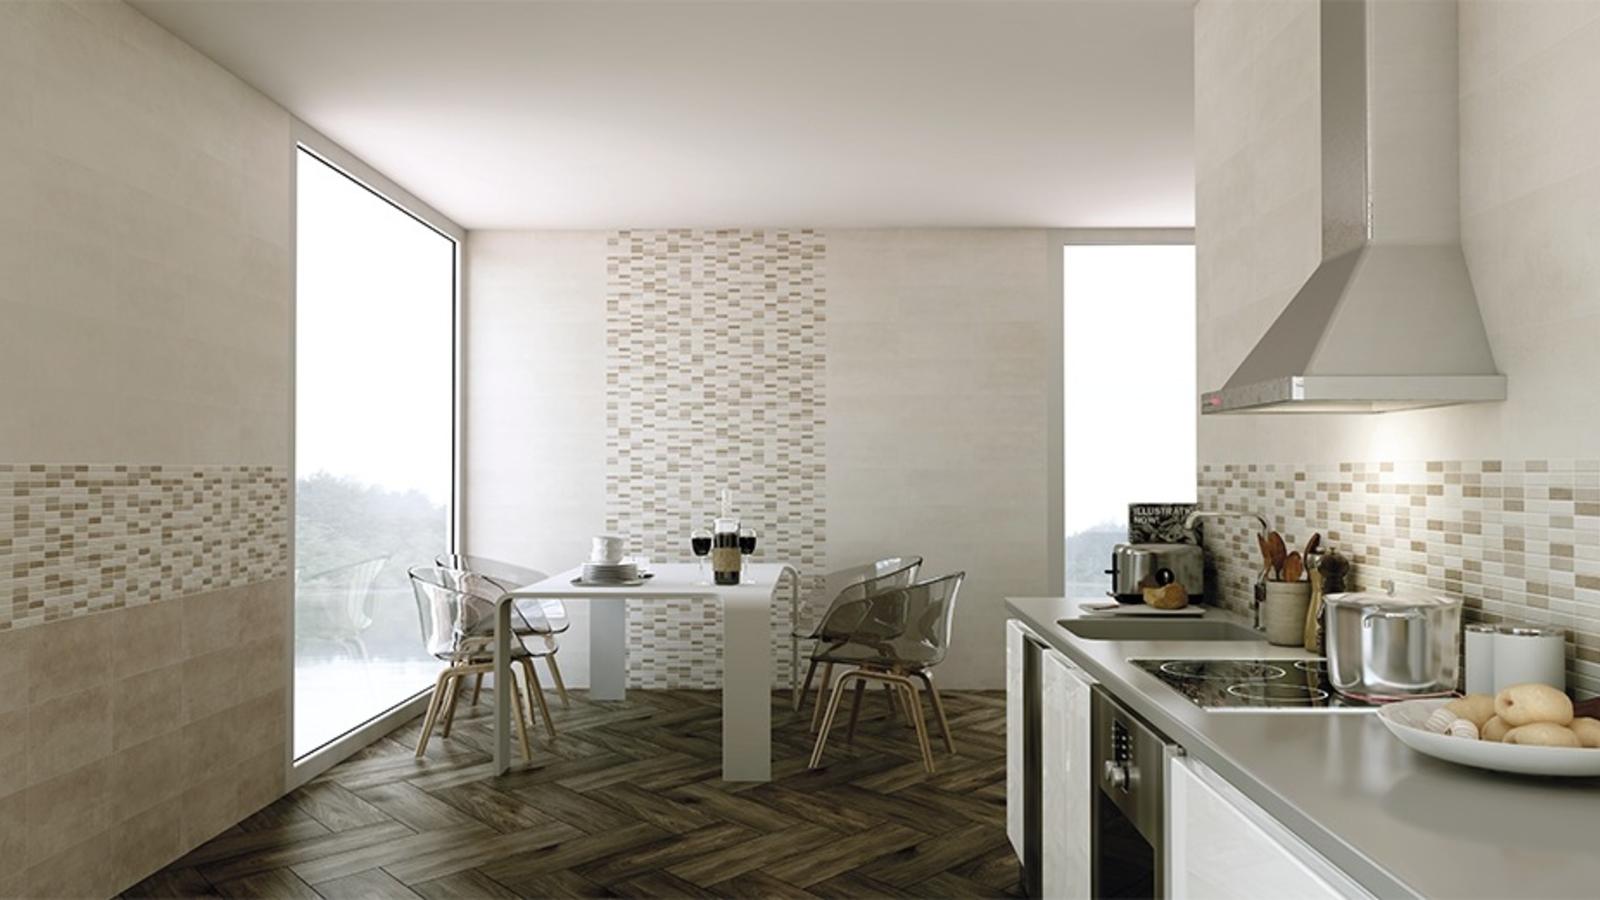 carrelage c ramique quebec de ecoceramic tile expert fournisseur de carrelage italien et. Black Bedroom Furniture Sets. Home Design Ideas